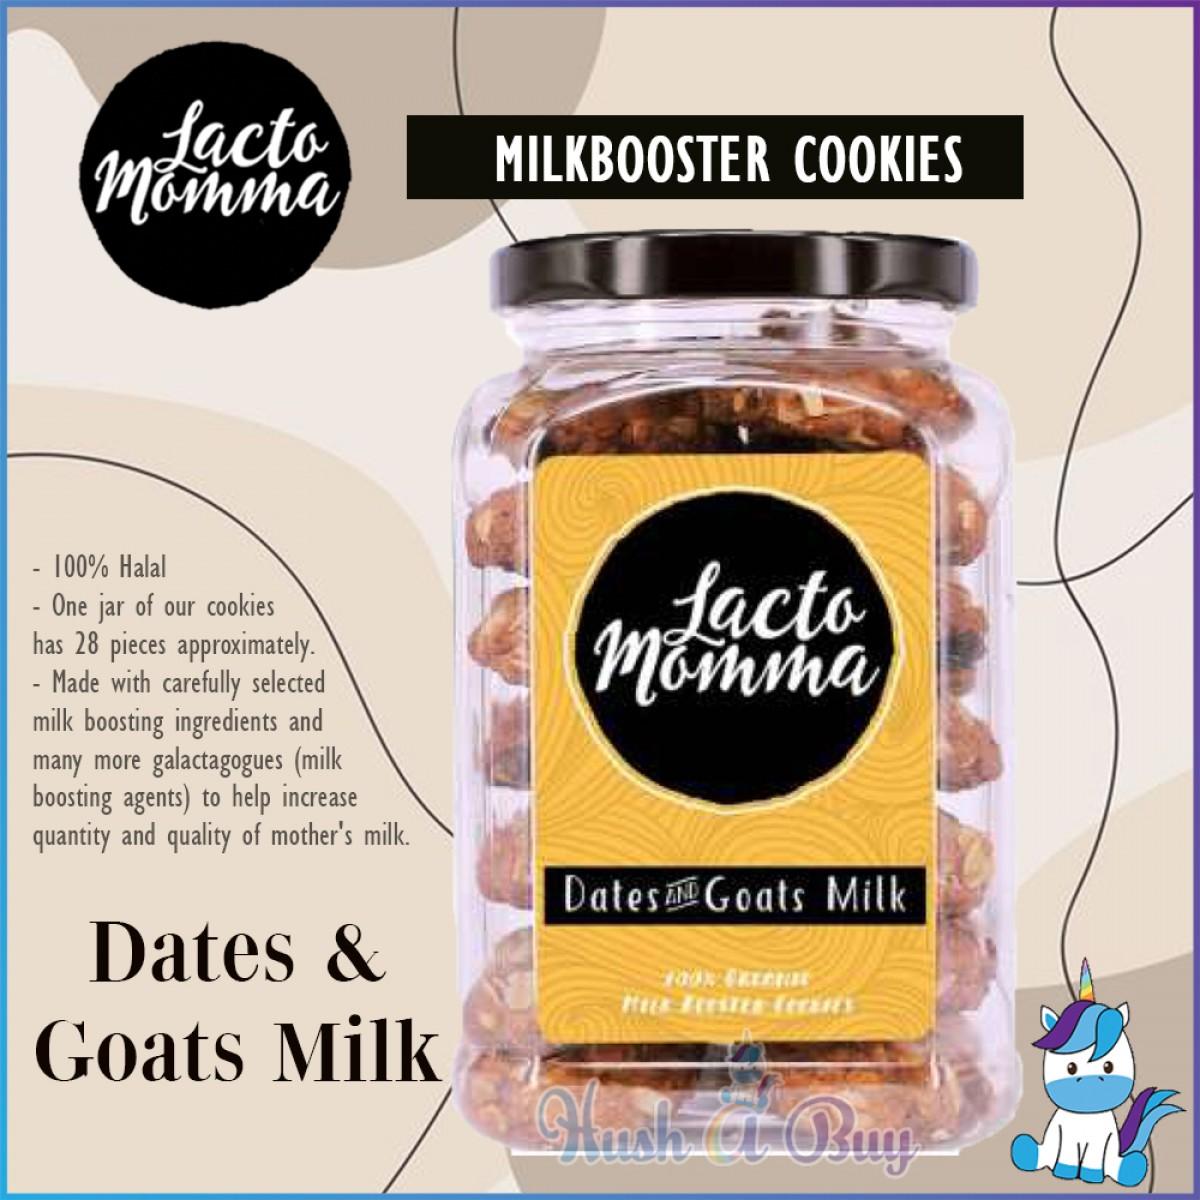 LactoMomma Milk Booster Cookies [7 Delicious Flavors] 100% Halal